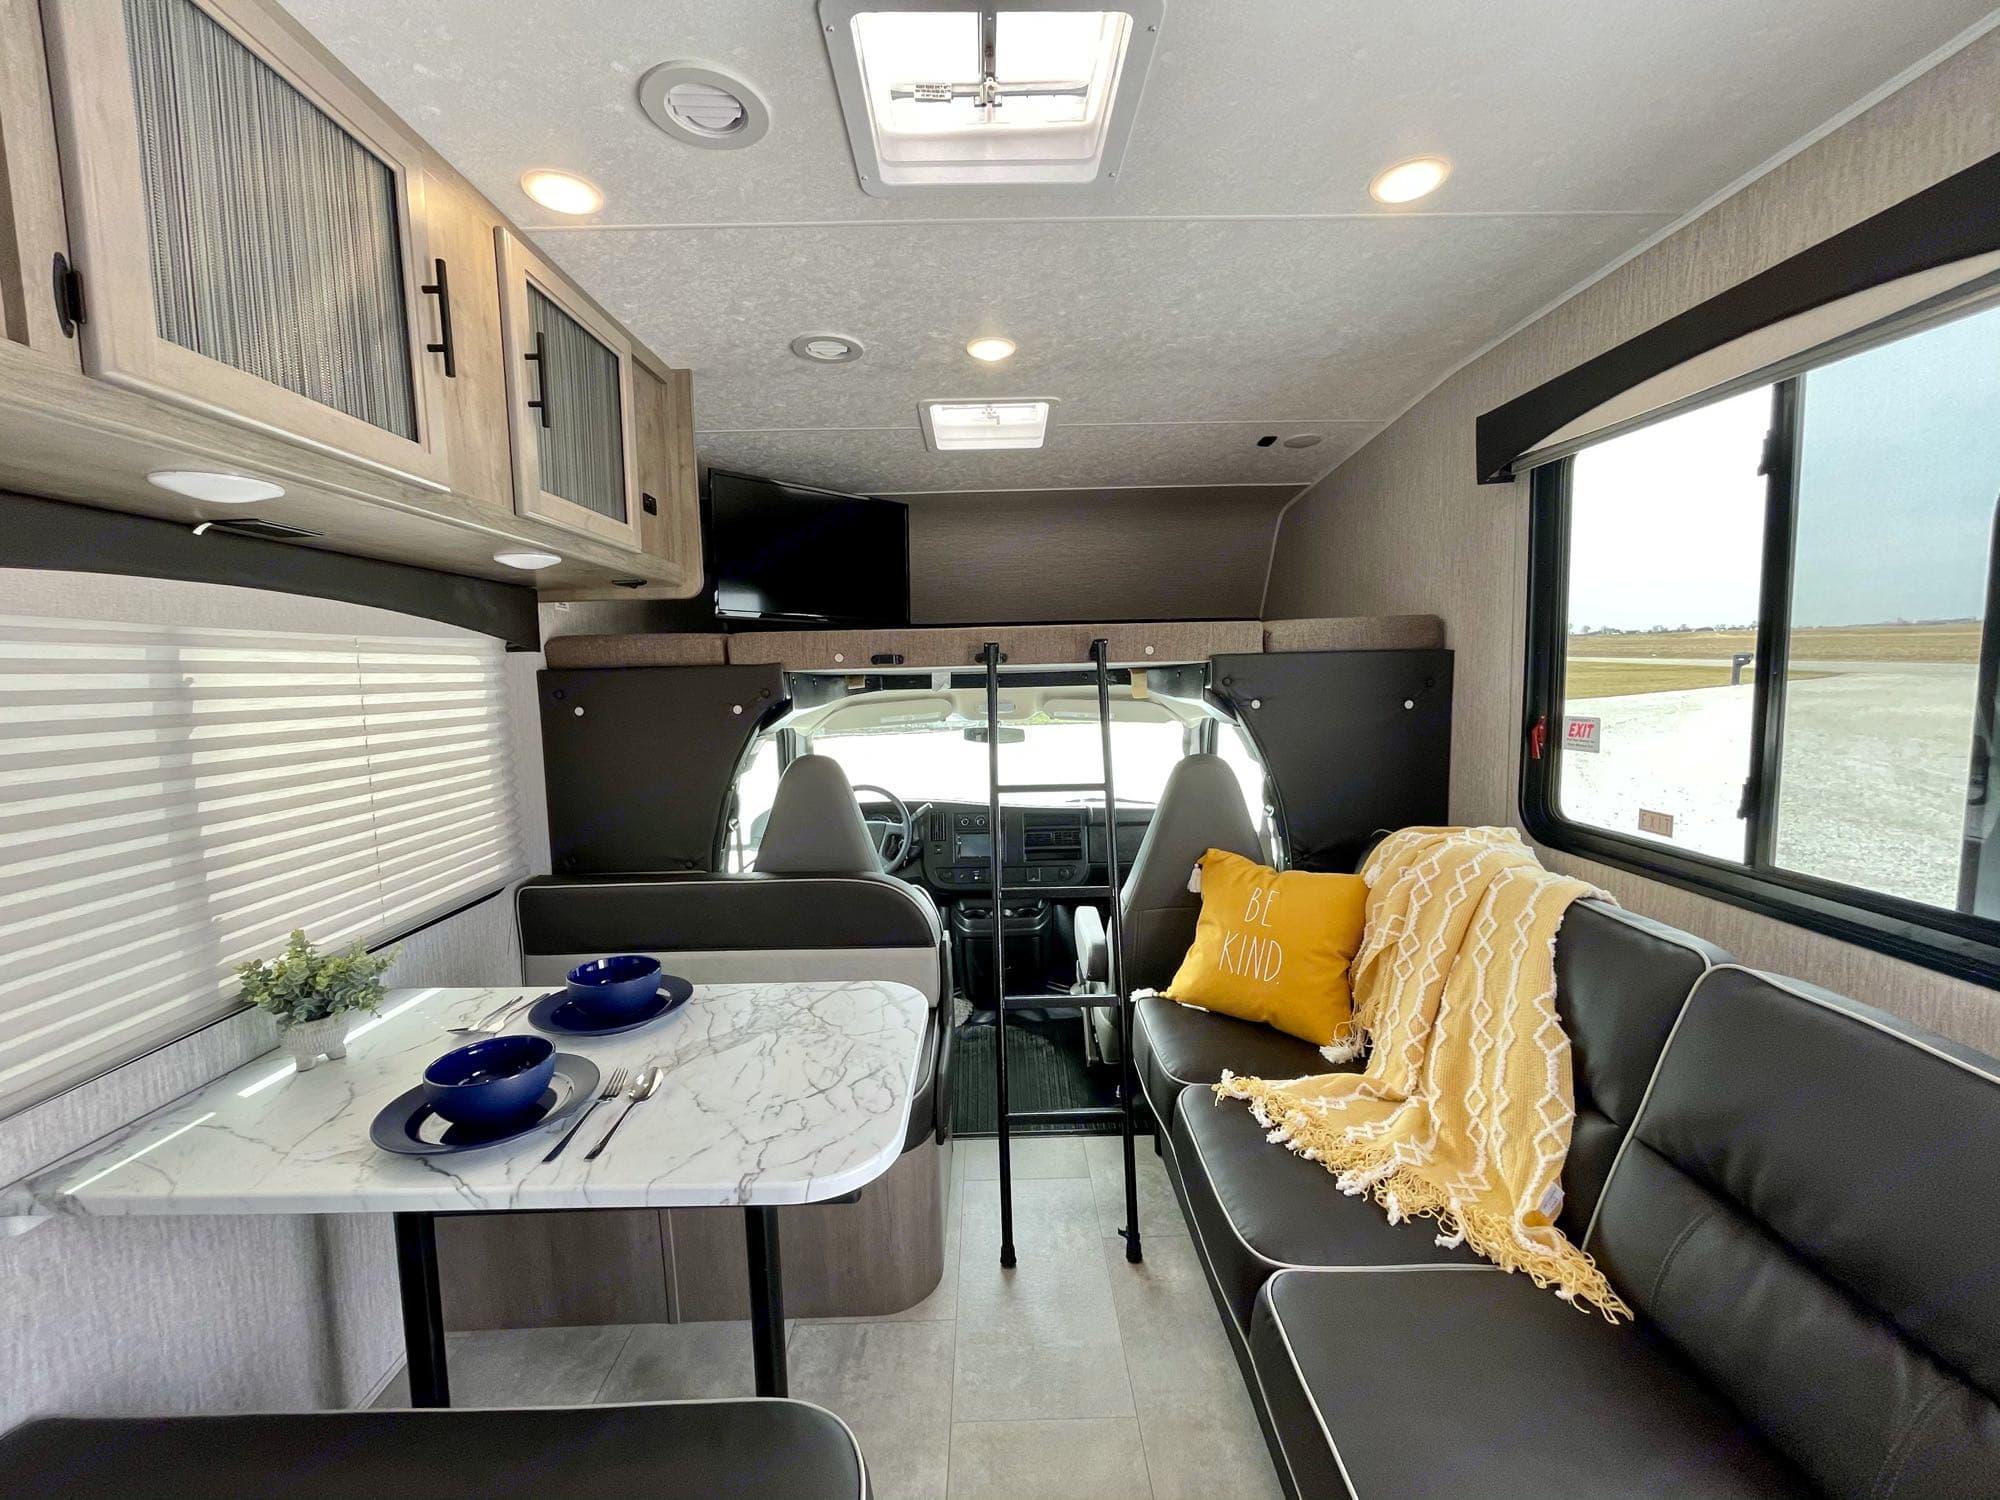 living area. jackknife sofa, dream dinette, overhead bunk. Coachmen Freelander 27QB 2021